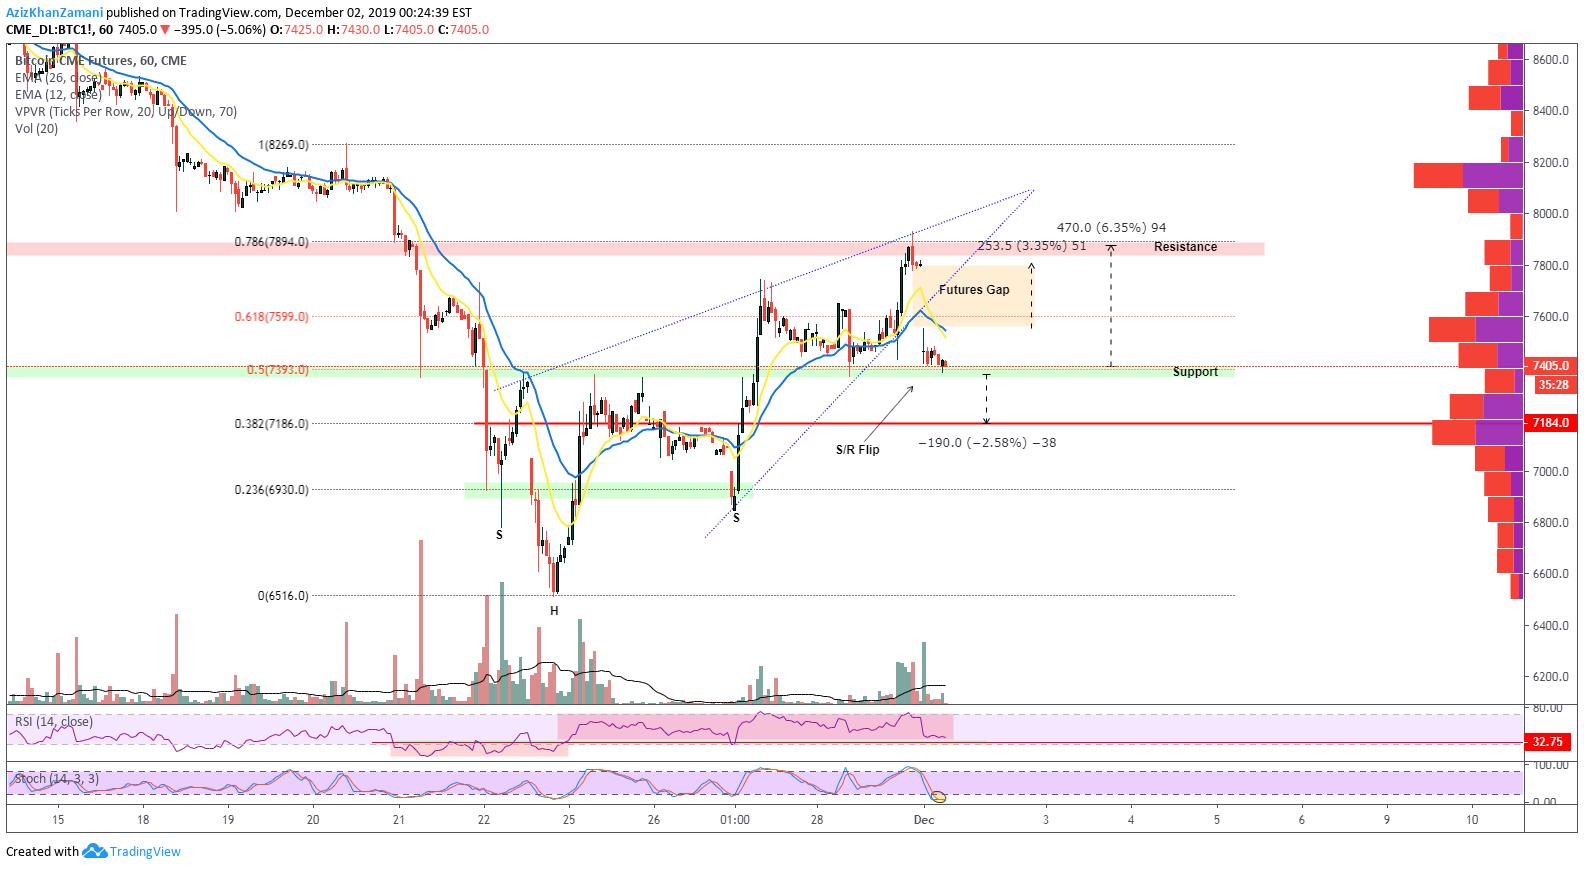 bitcoin cme futures gap Tradingview